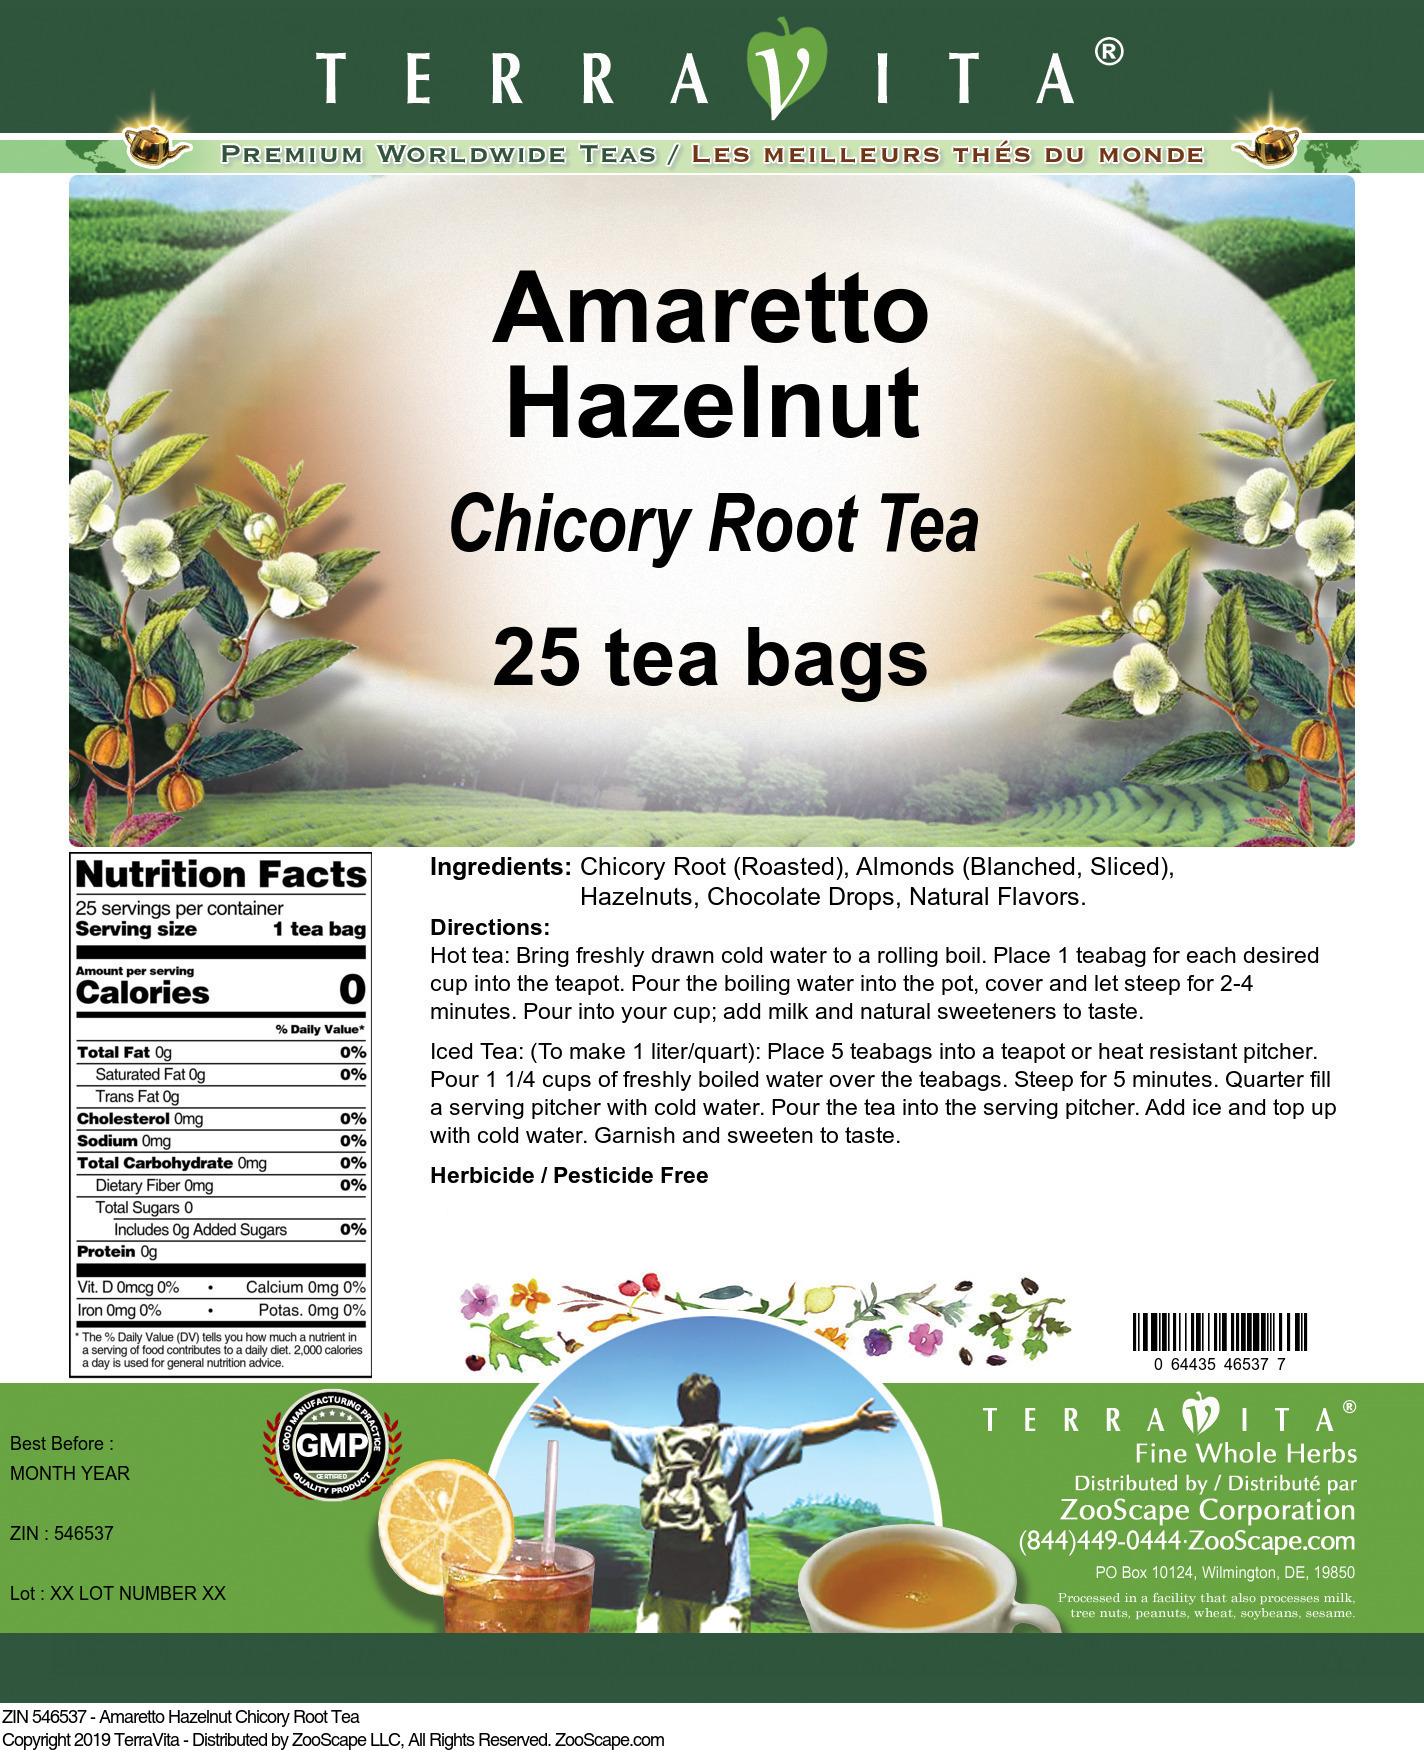 Amaretto Hazelnut Chicory Root